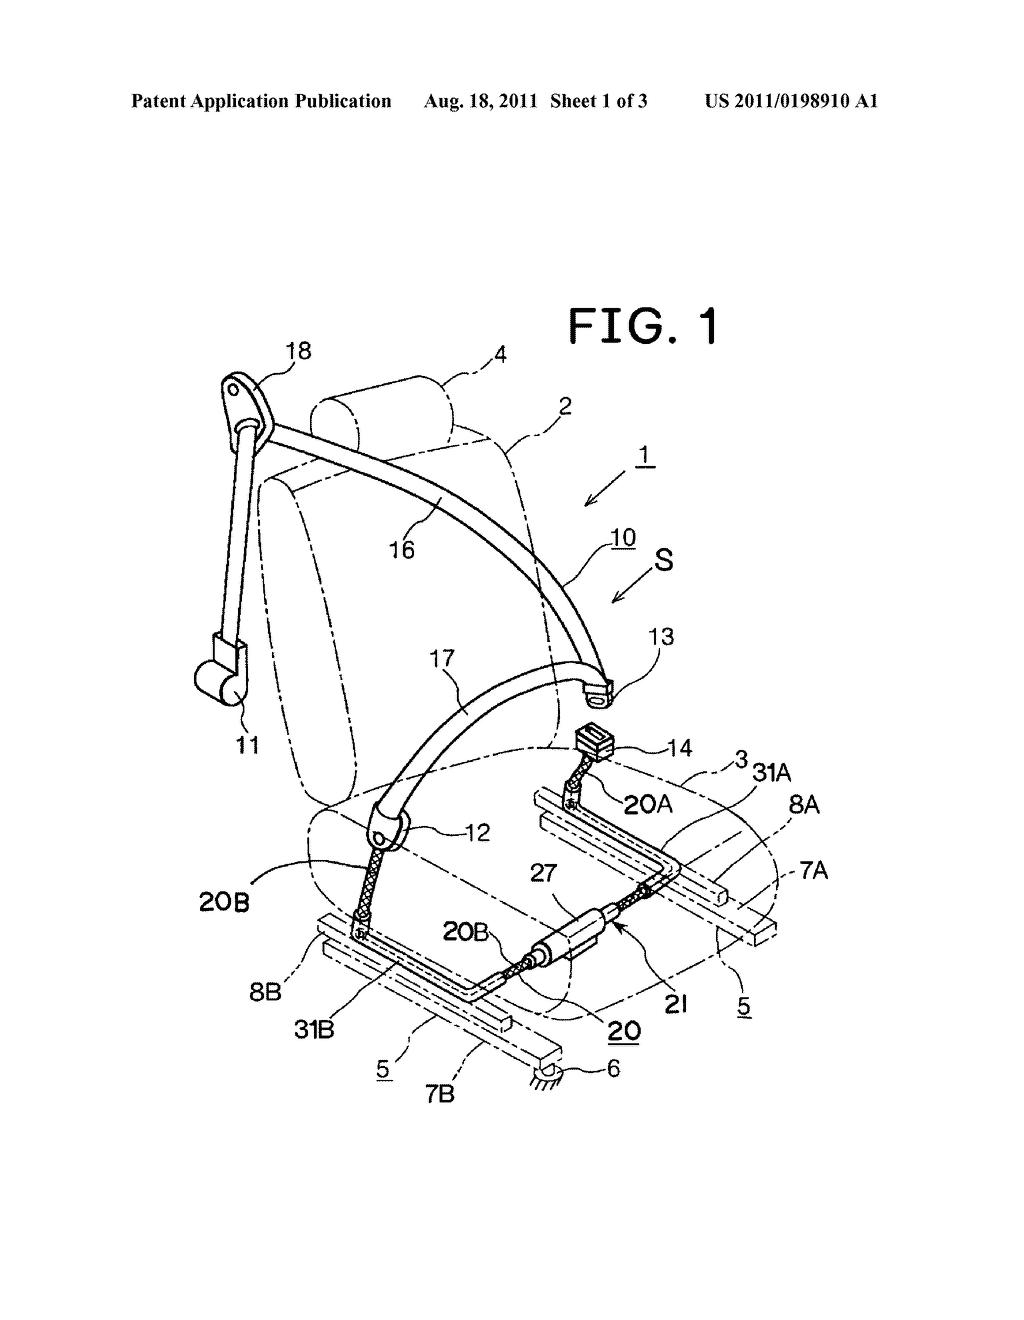 Crx Wiring Diagram Fuse Car Fuse Diagram Wiring Diagram